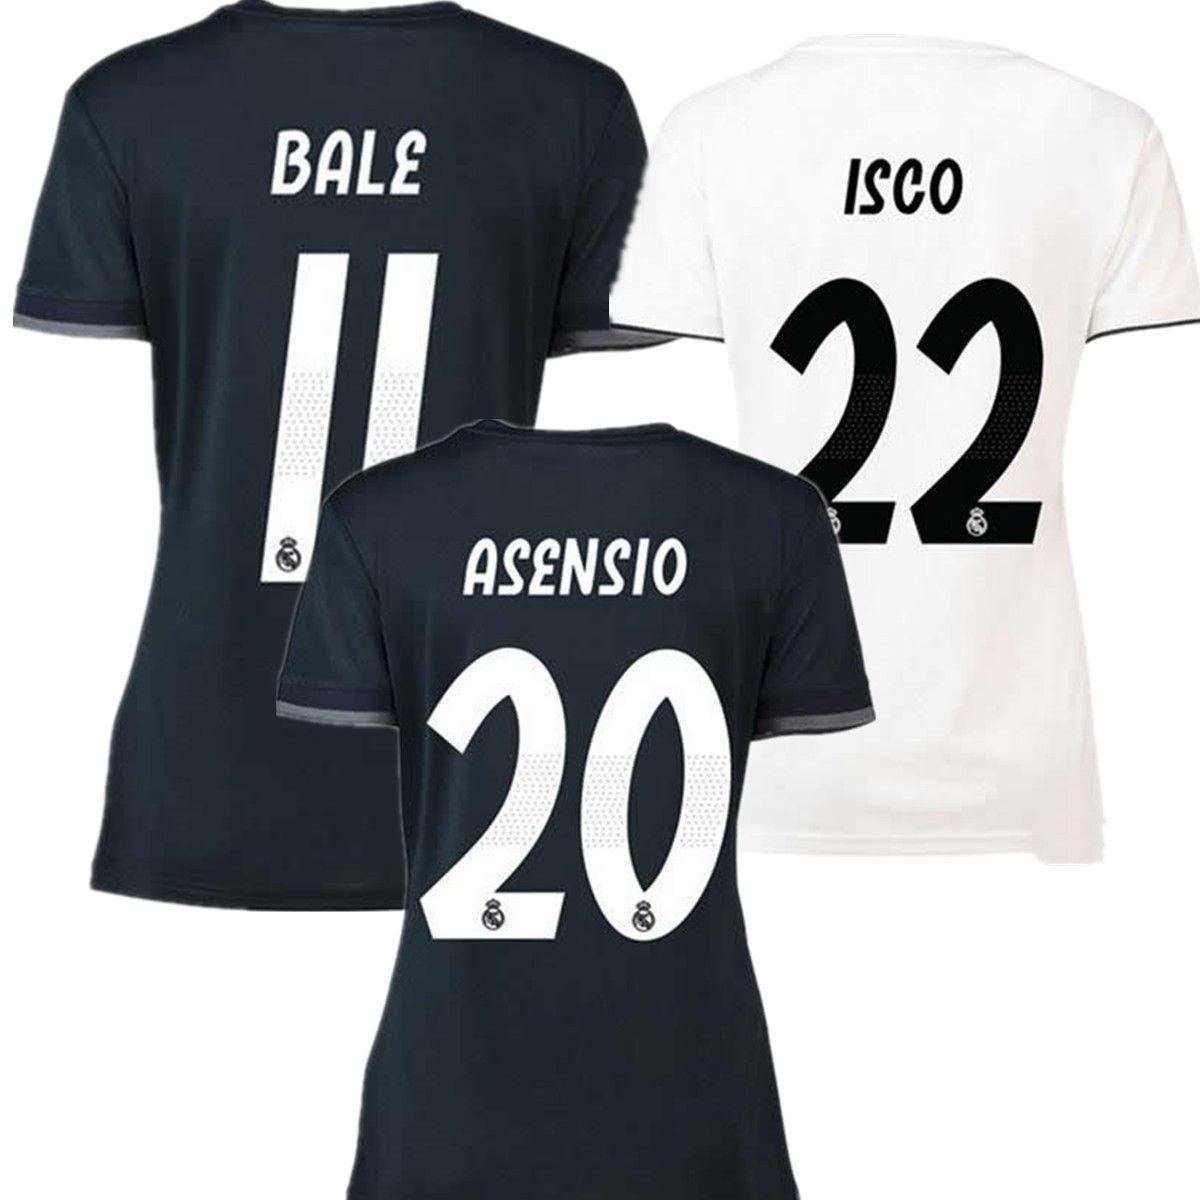 18 19 Mujeres Camiseta De Fútbol Real Madrid Camiseta De Fútbol RONALDO  BALE RAMOS KROOS BENZEMA LUCAS Camiseta 2018 2019 Modric Madrid Niña  Maillot Por ... 82edf1ce4b919